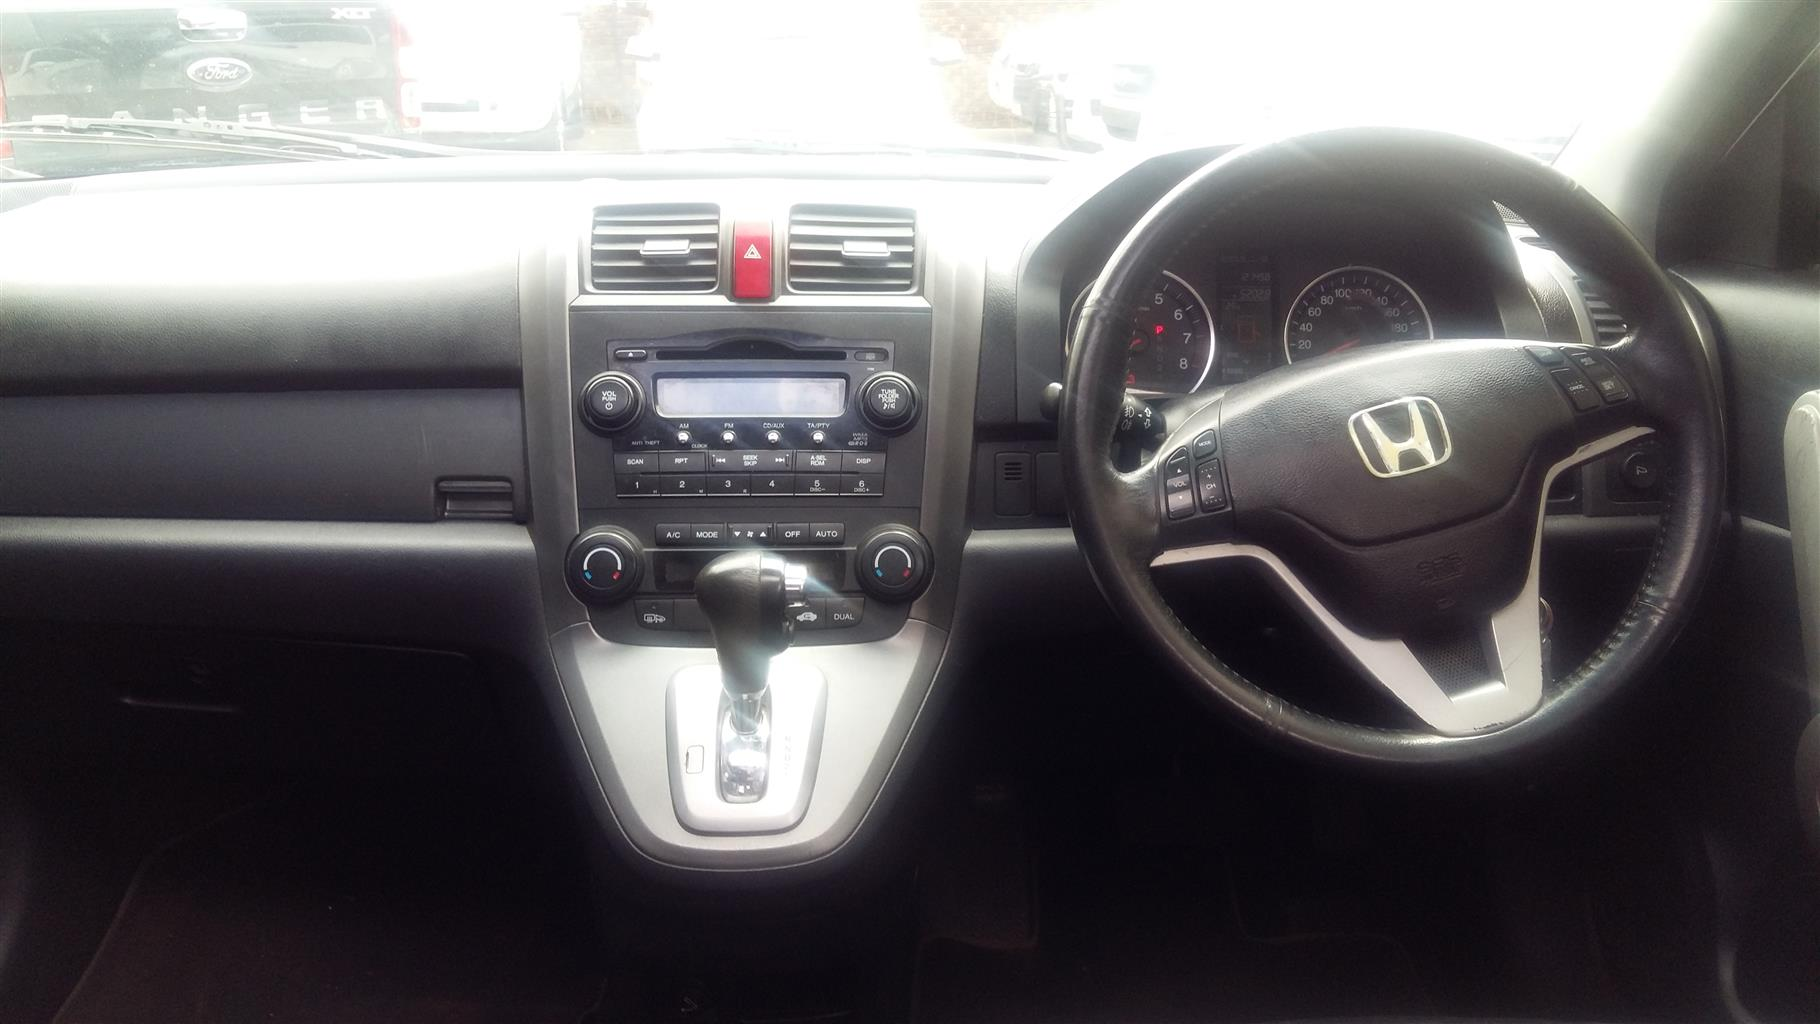 2007 Honda CR-V 2.0 RVi automatic